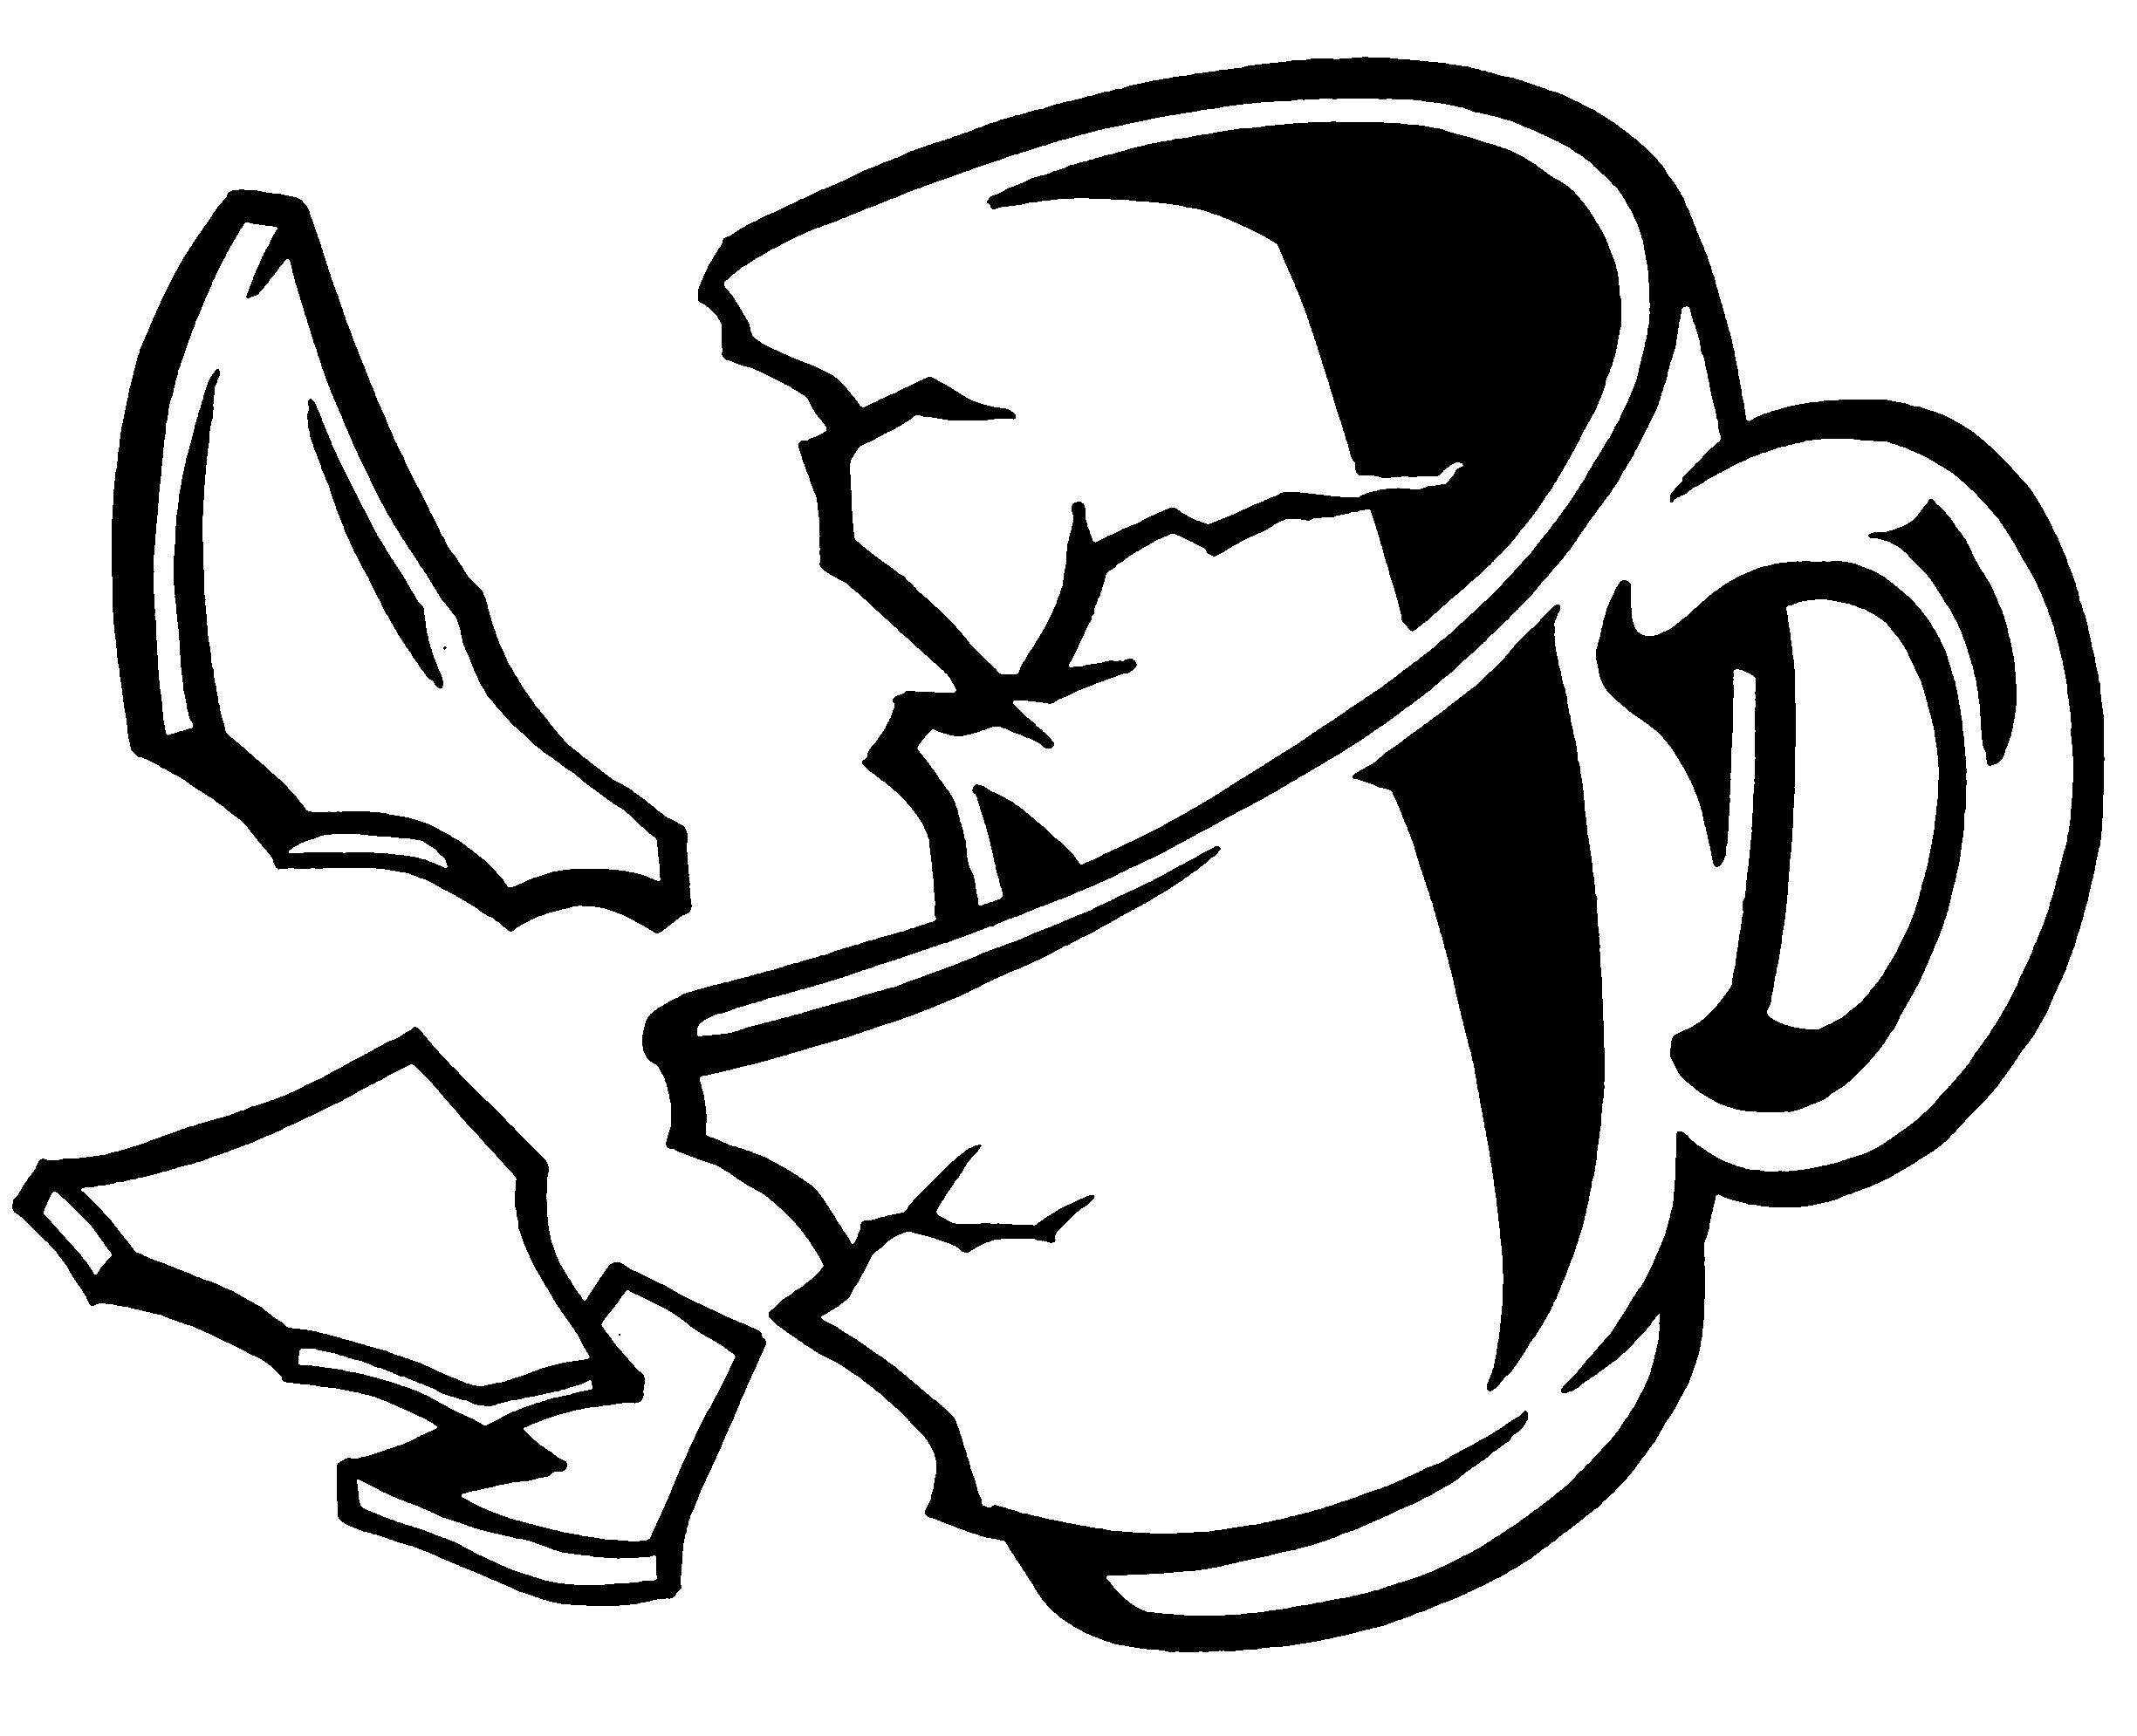 Free Broken Glass Clipart, Download Free Clip Art, Free Clip.